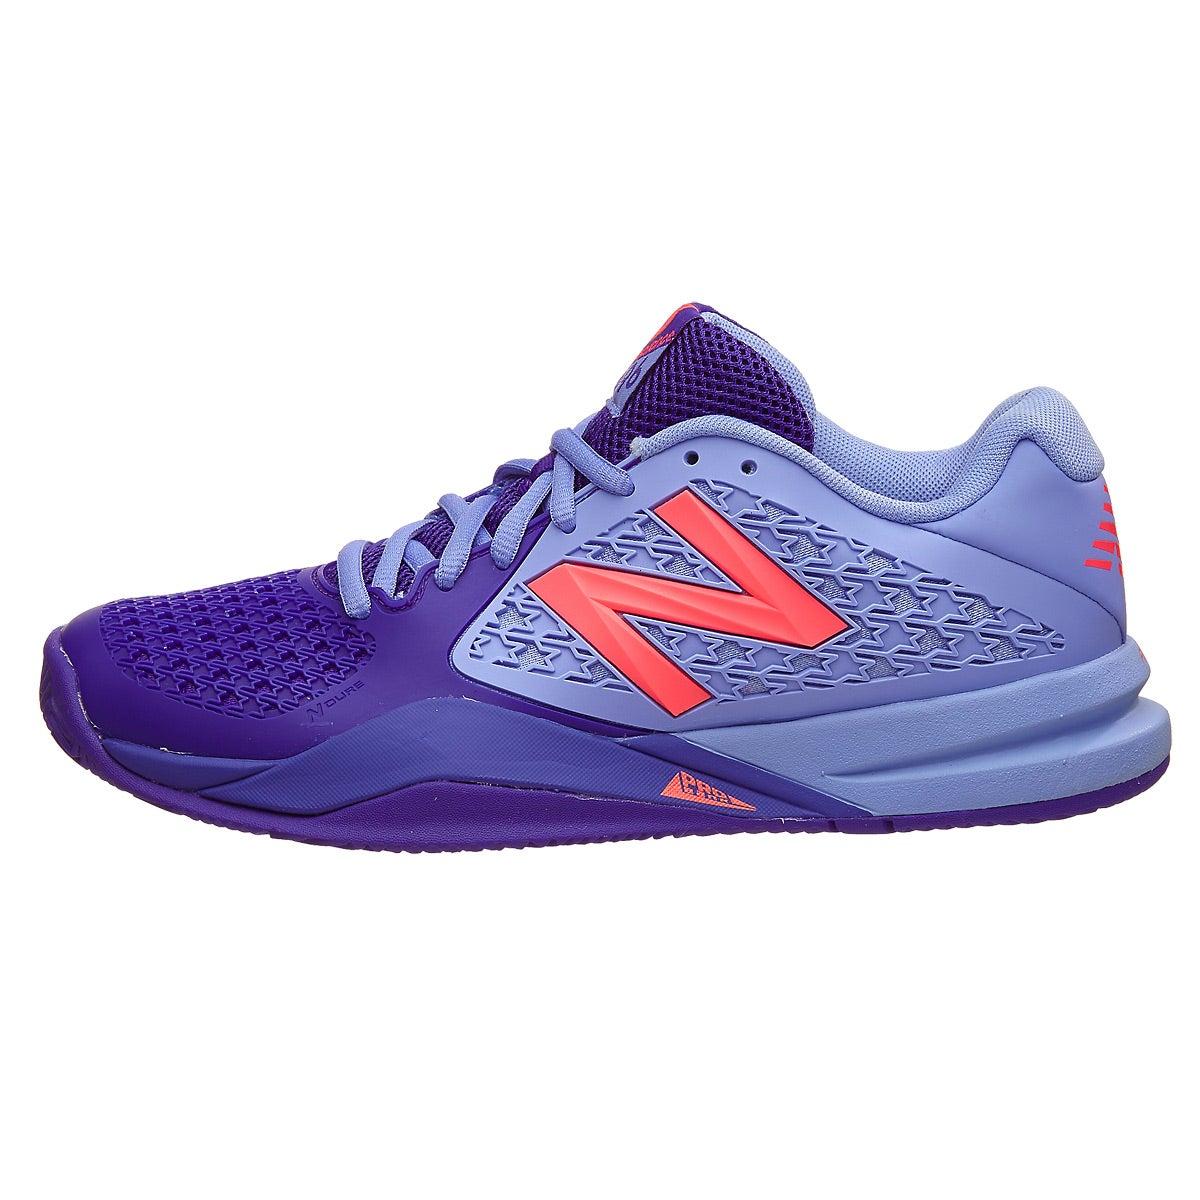 New Balance WC 996v2 B Spectral Blue/Pink Women's Shoe 360 ...